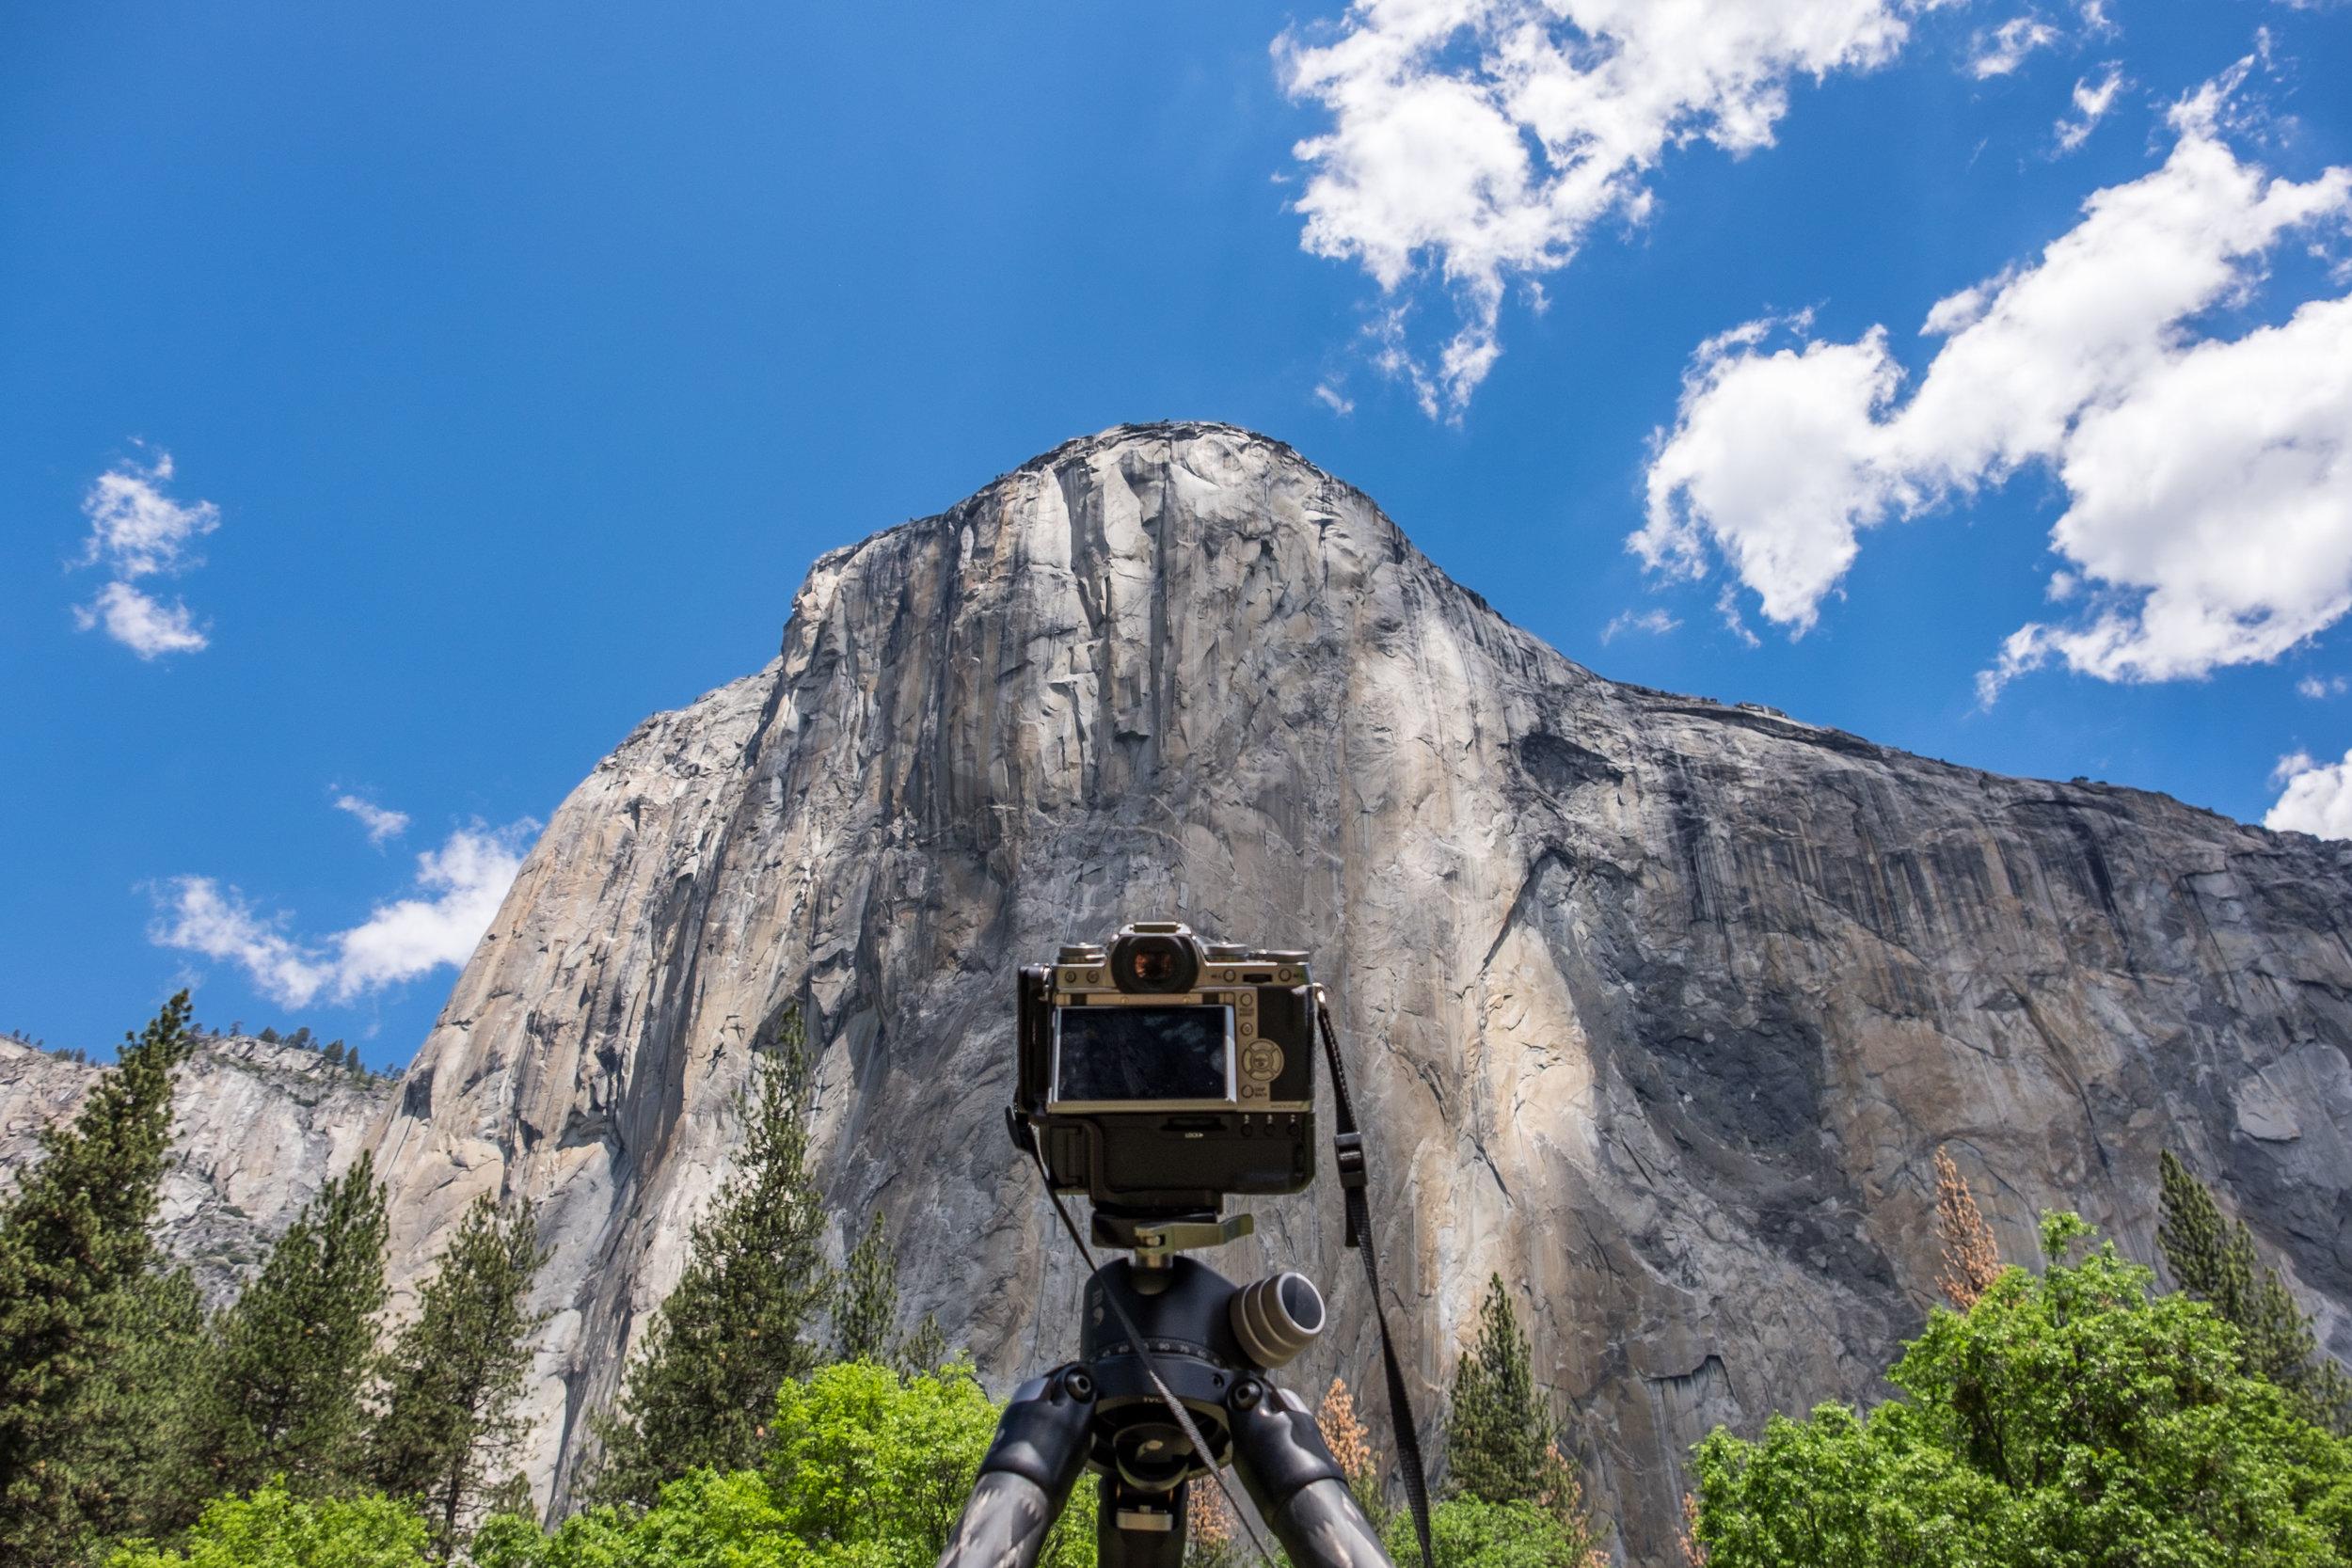 20160519-SP-Yosemite National Park-_DSF4655.jpg